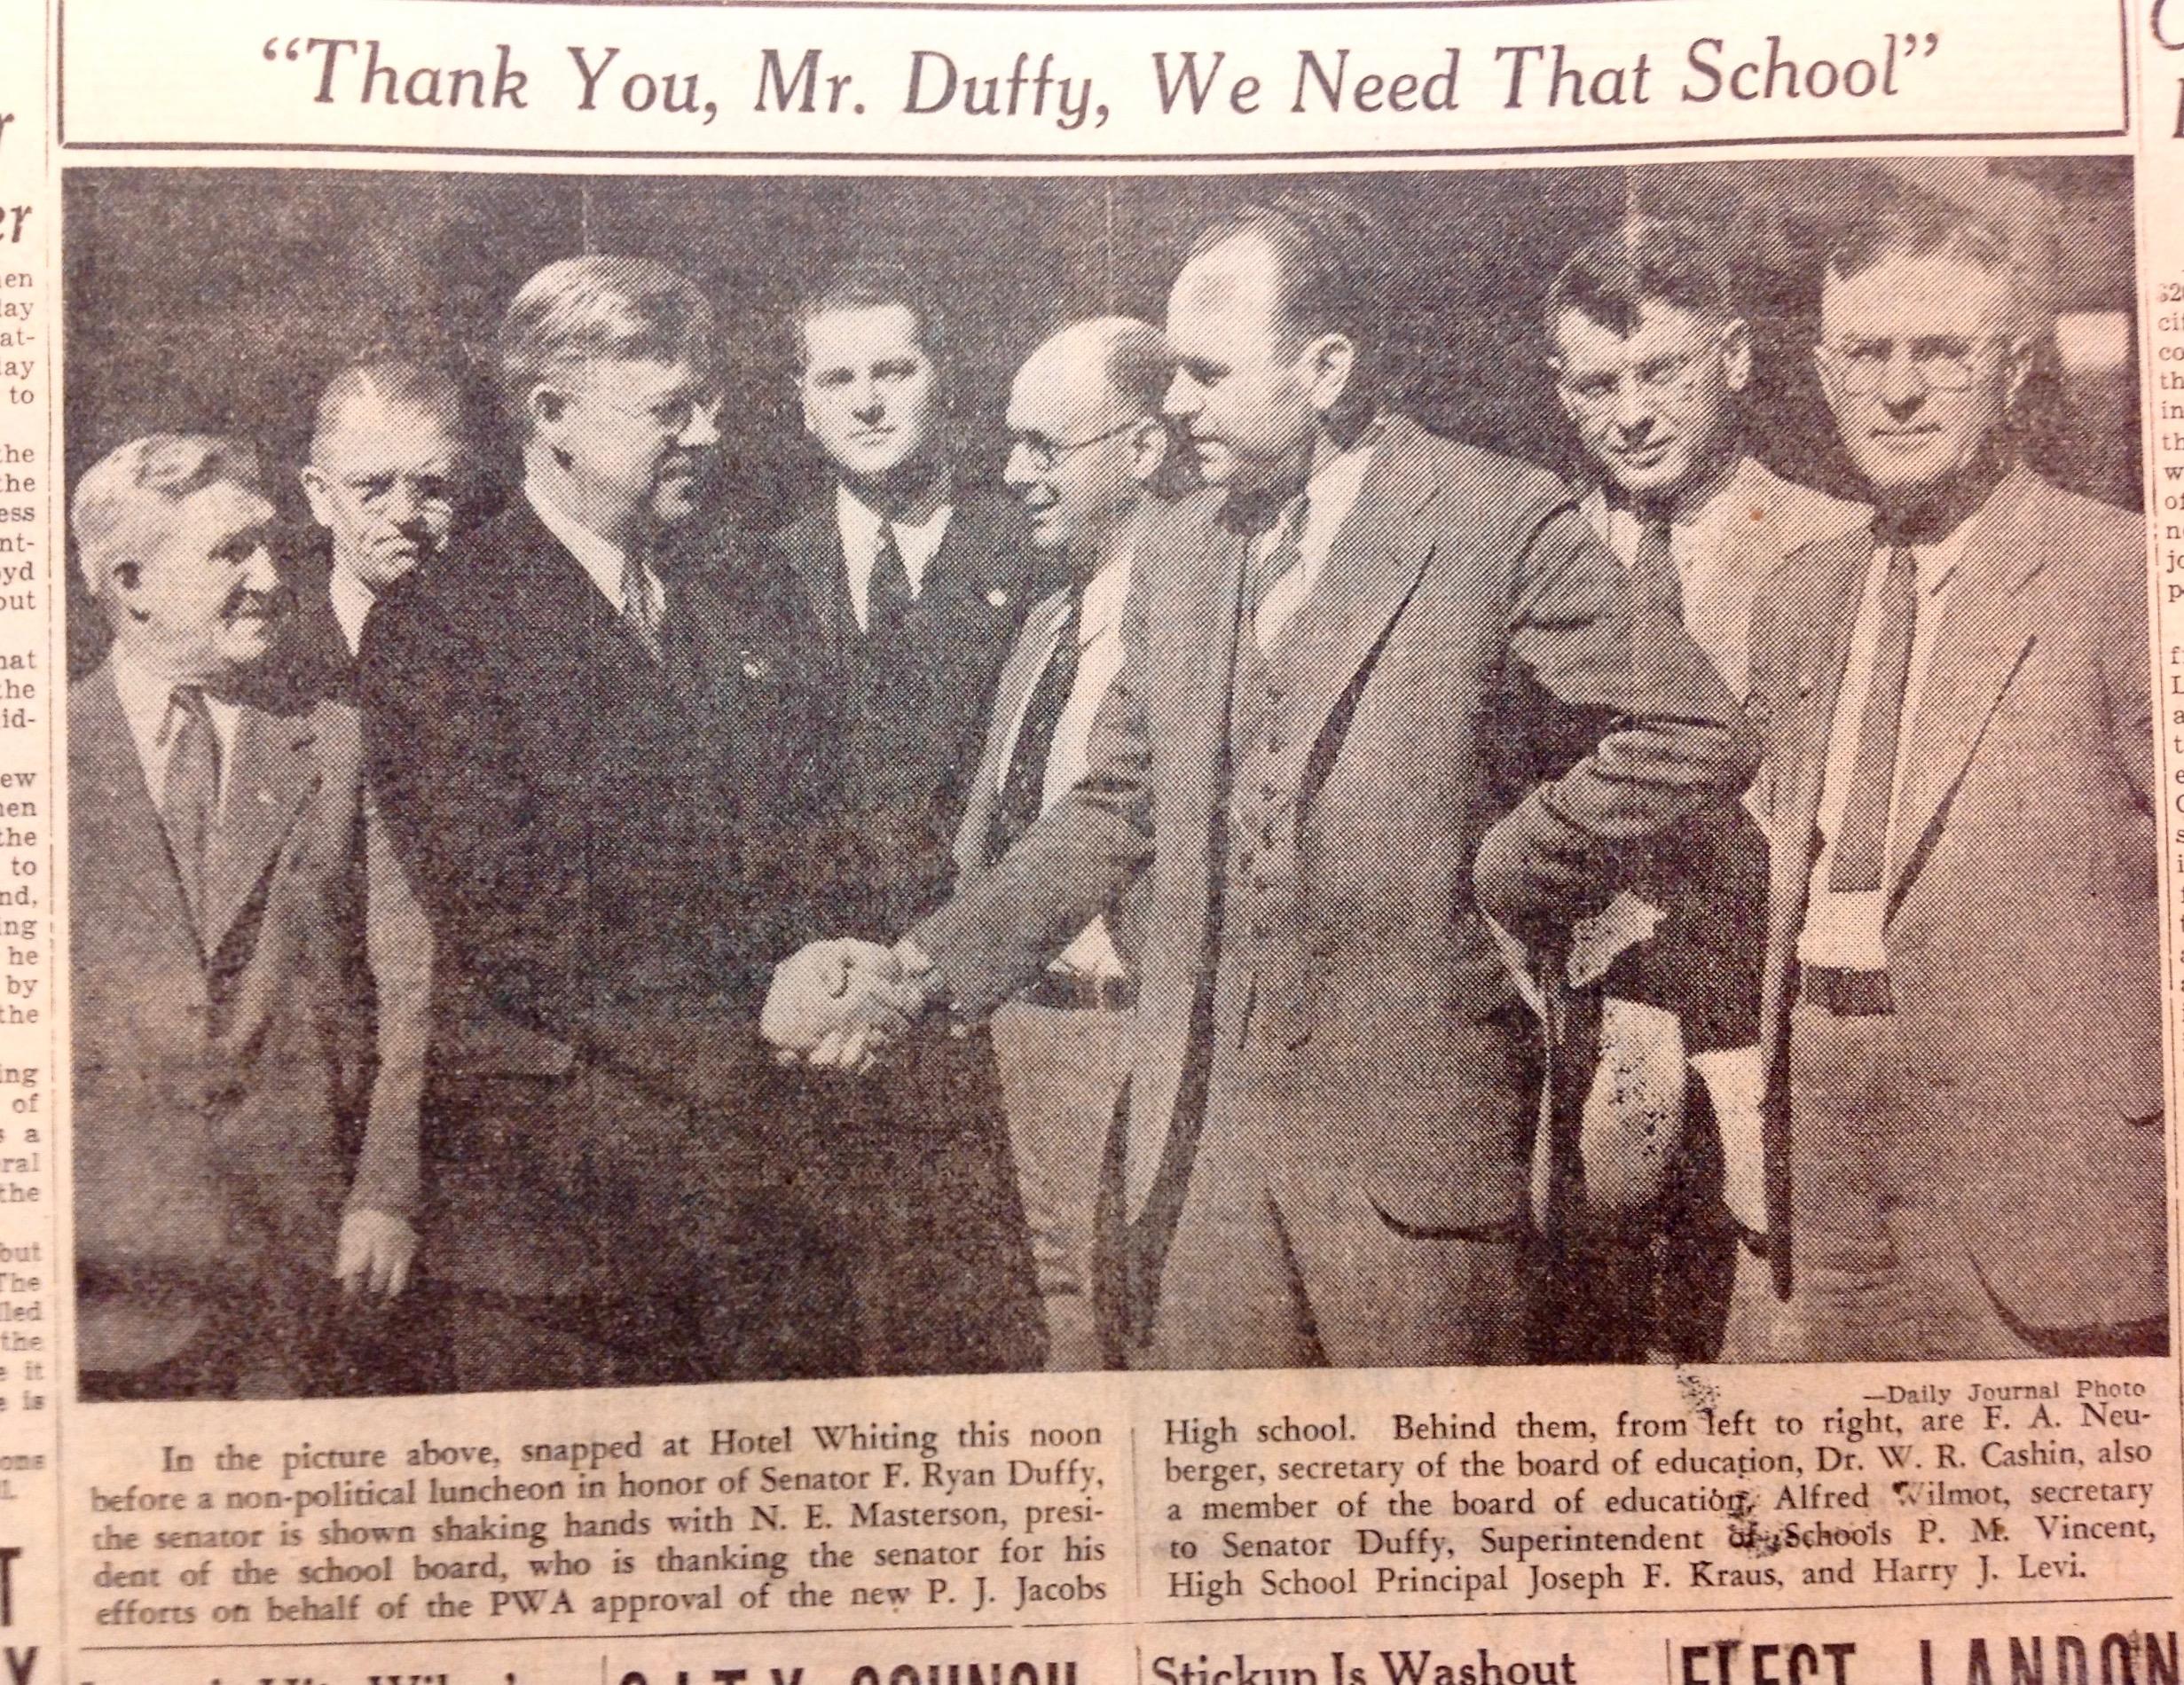 Senator Duffy